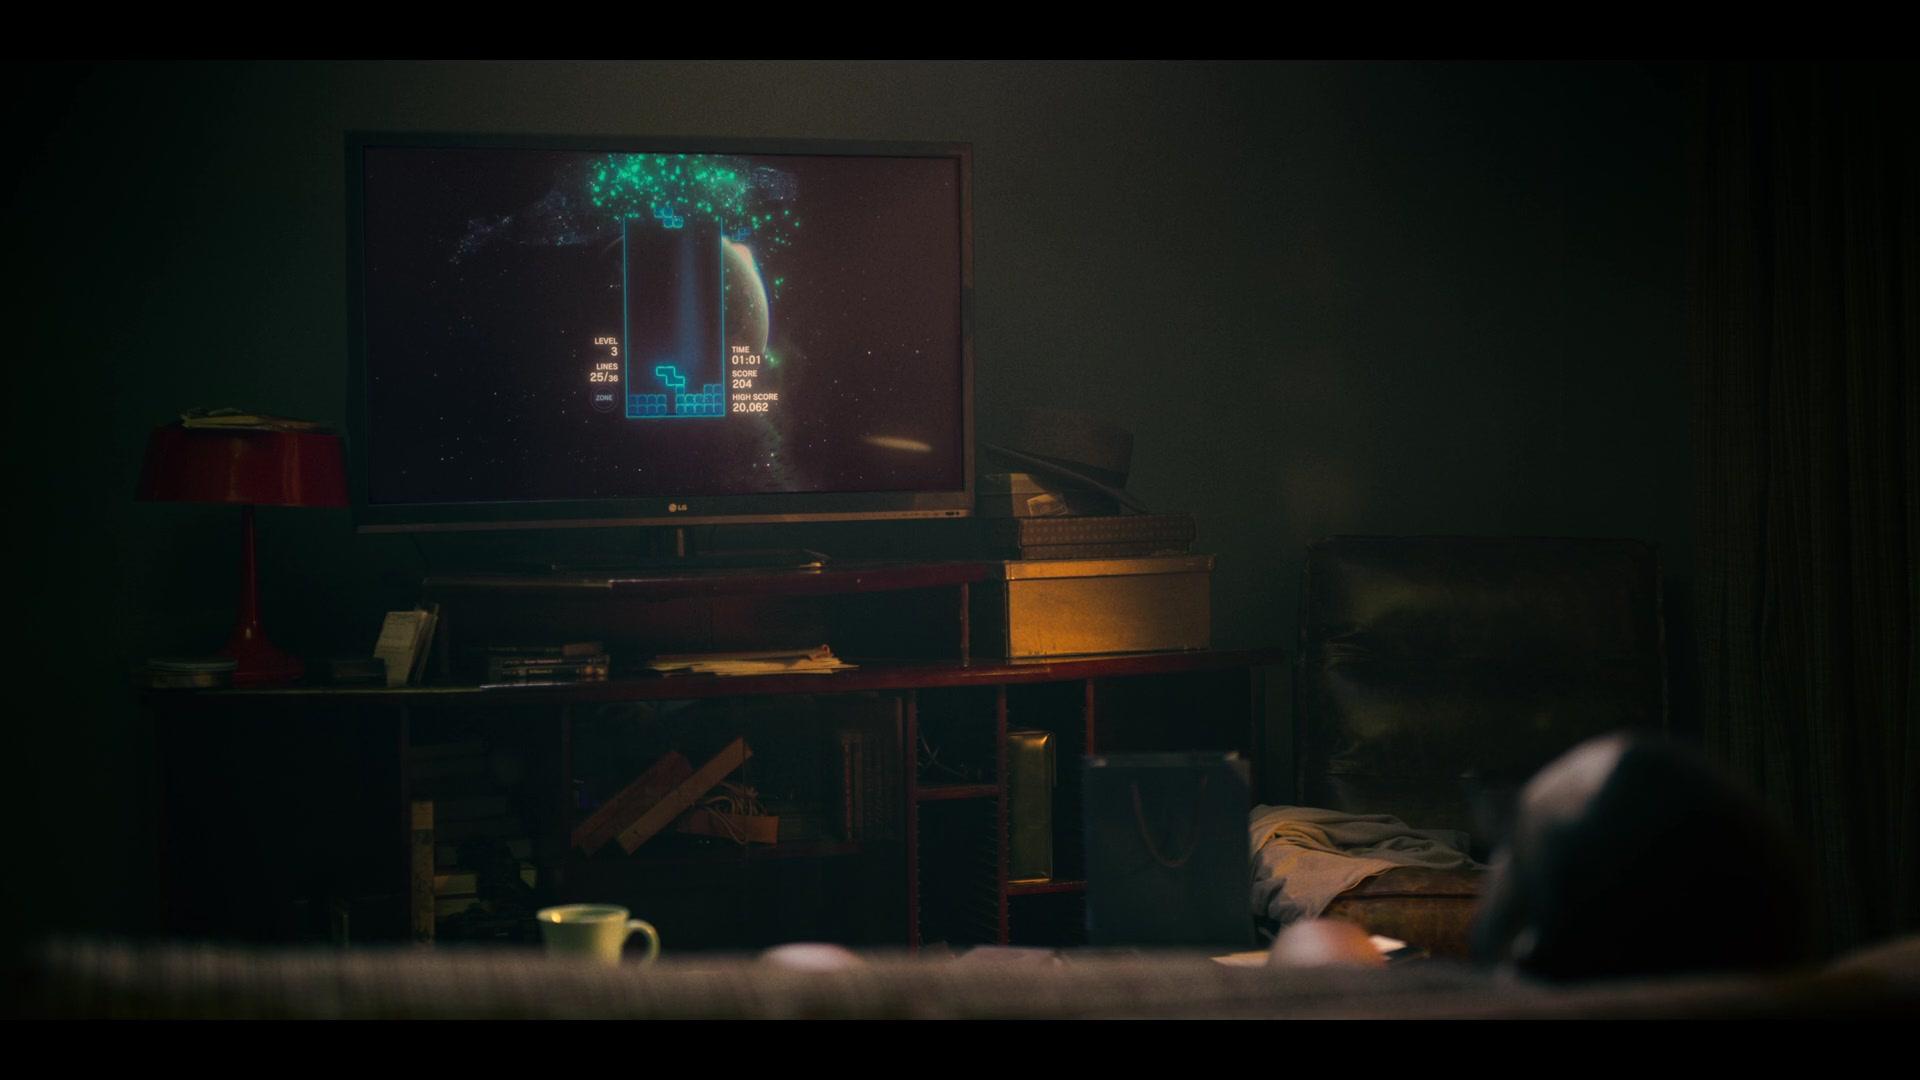 LG TV in Black Mirror - Season 5, Episode 1,